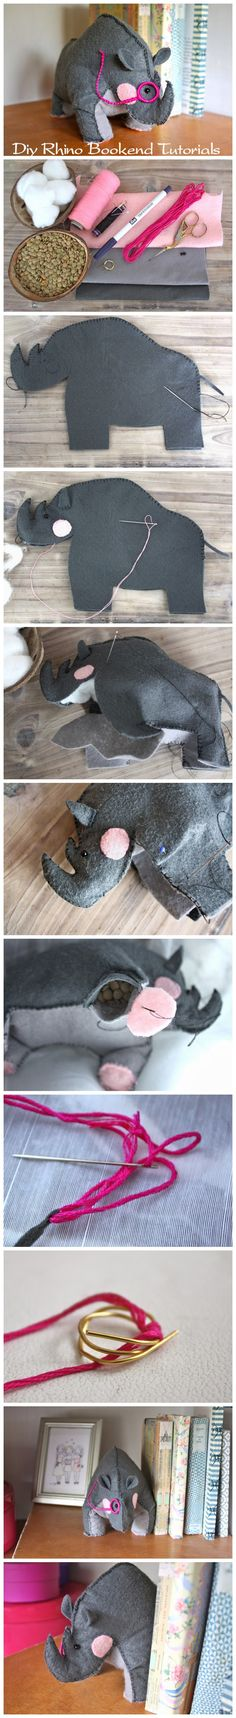 Rhino Bookend Tutorial